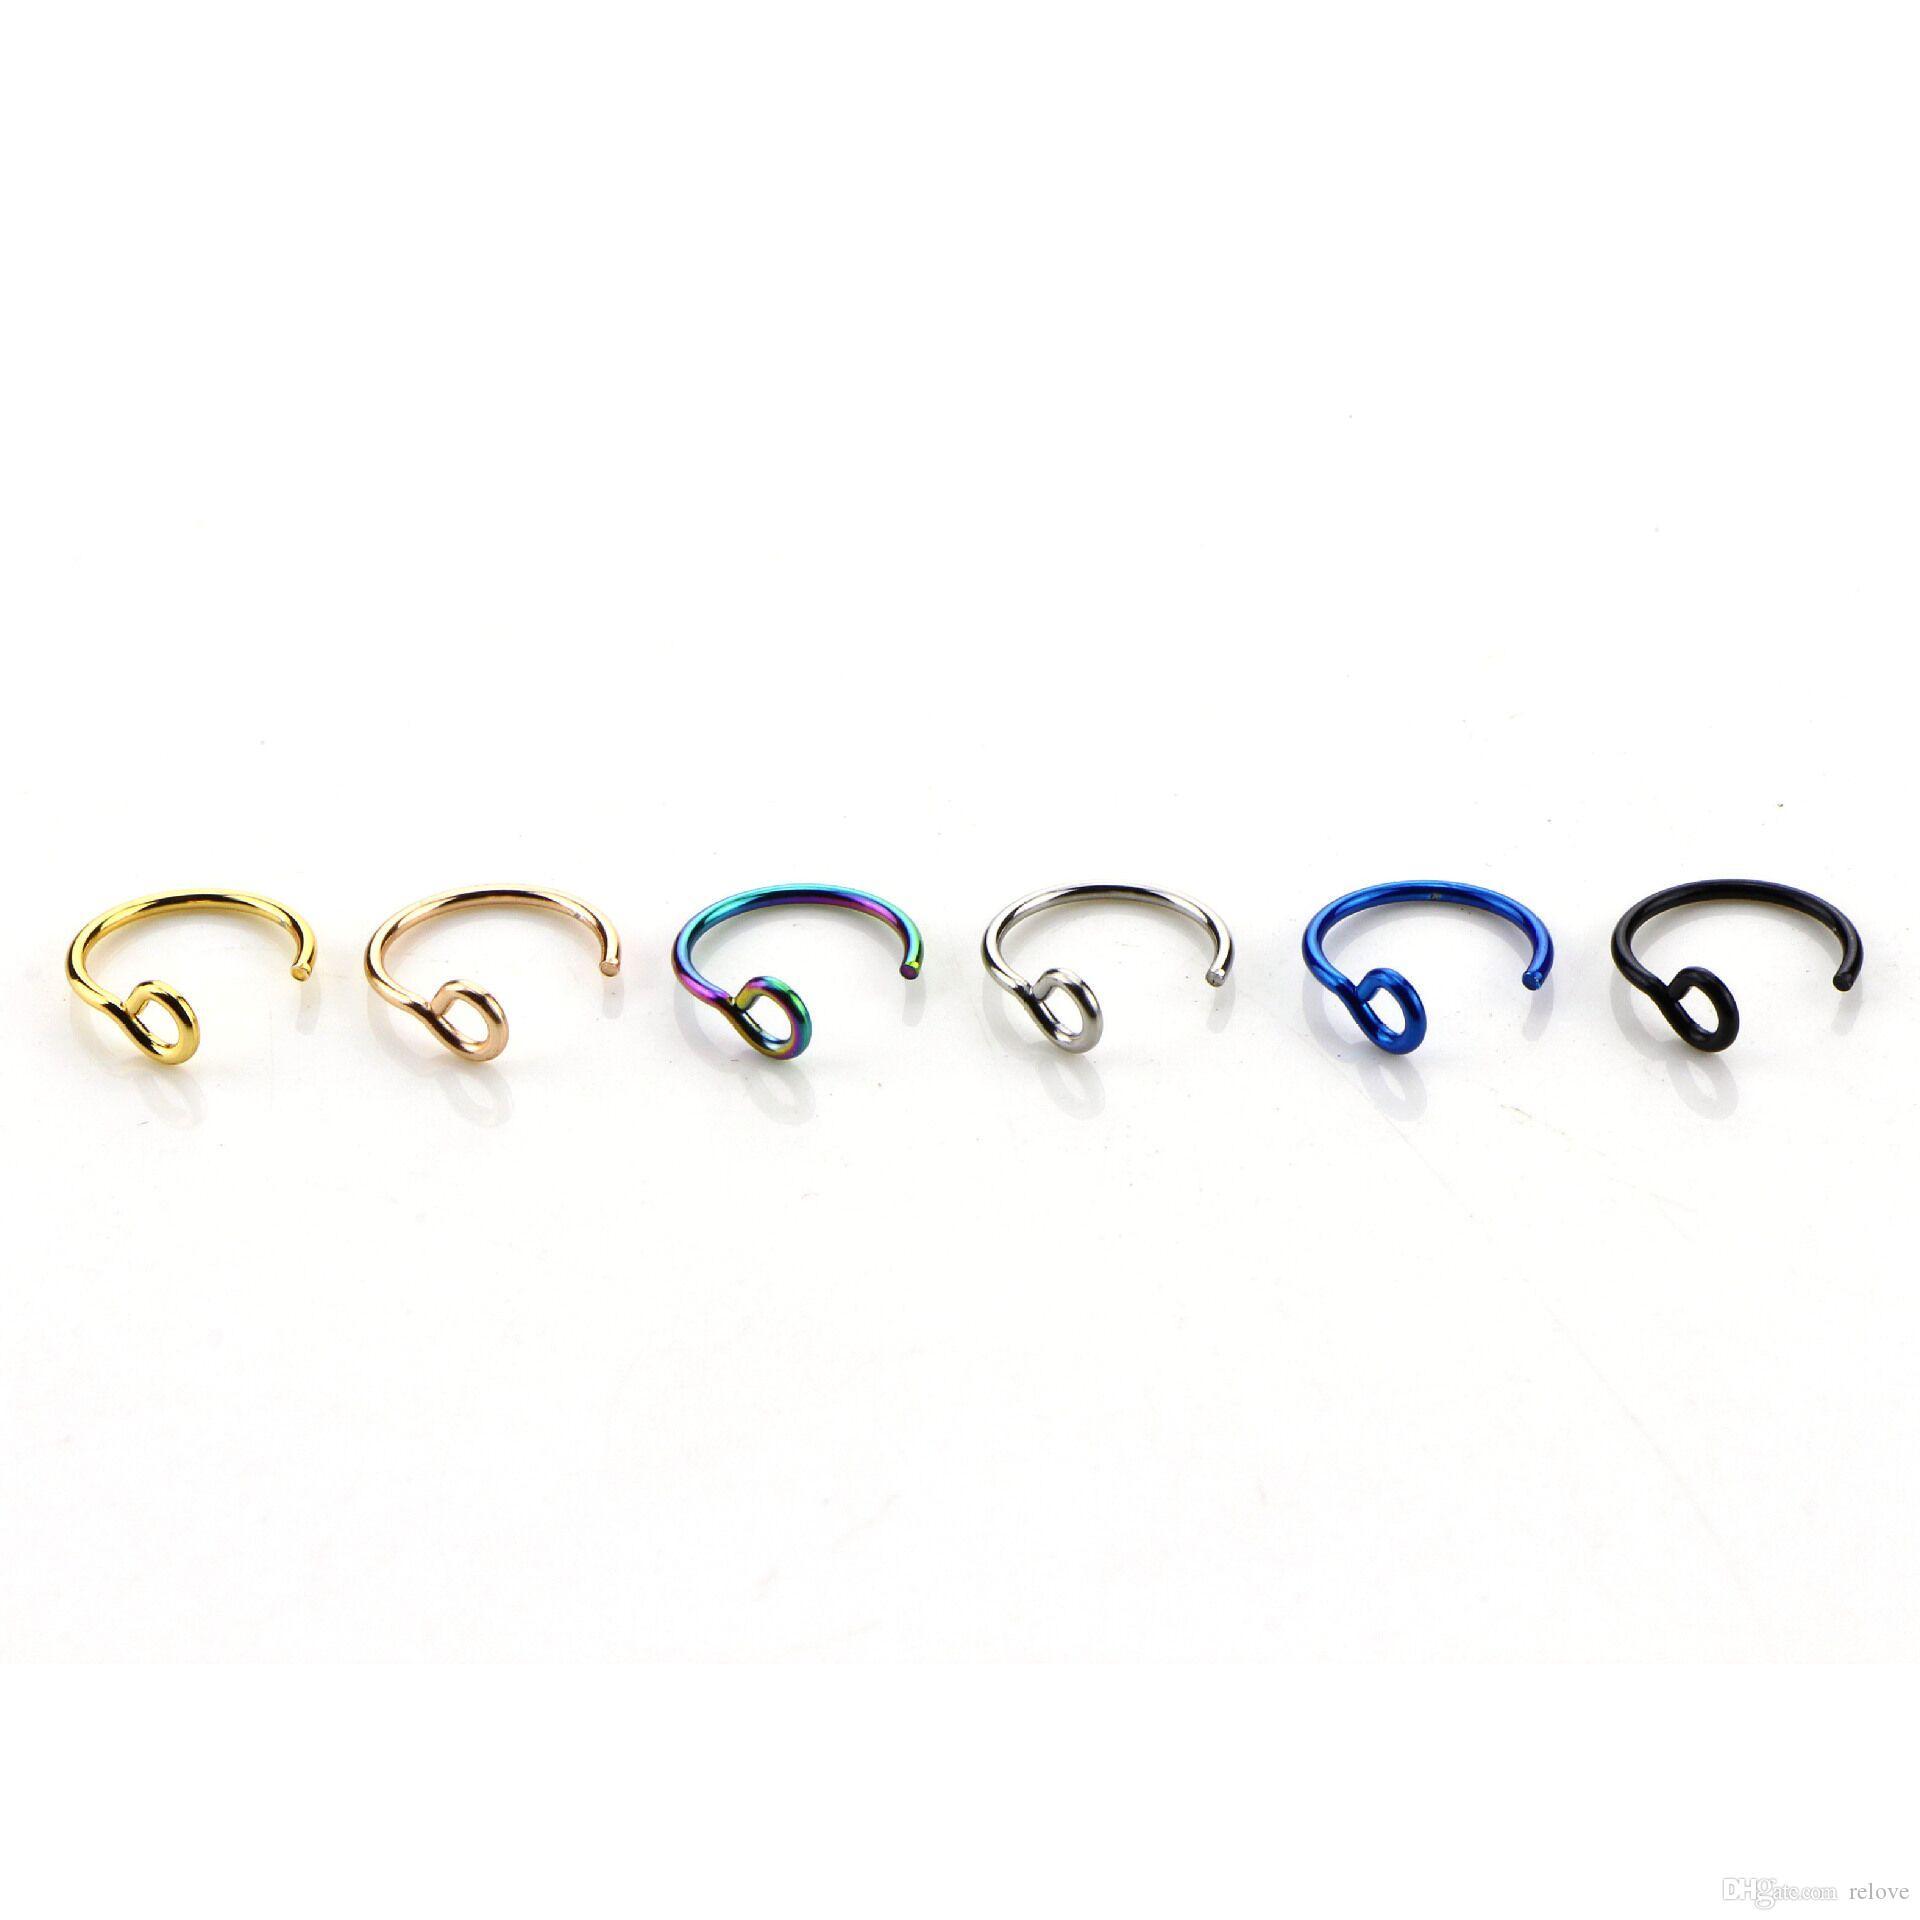 Boby Nose Fake Piercing Rings Stud Punk False Earrings Nipple Ring Septum Factory Wholesale